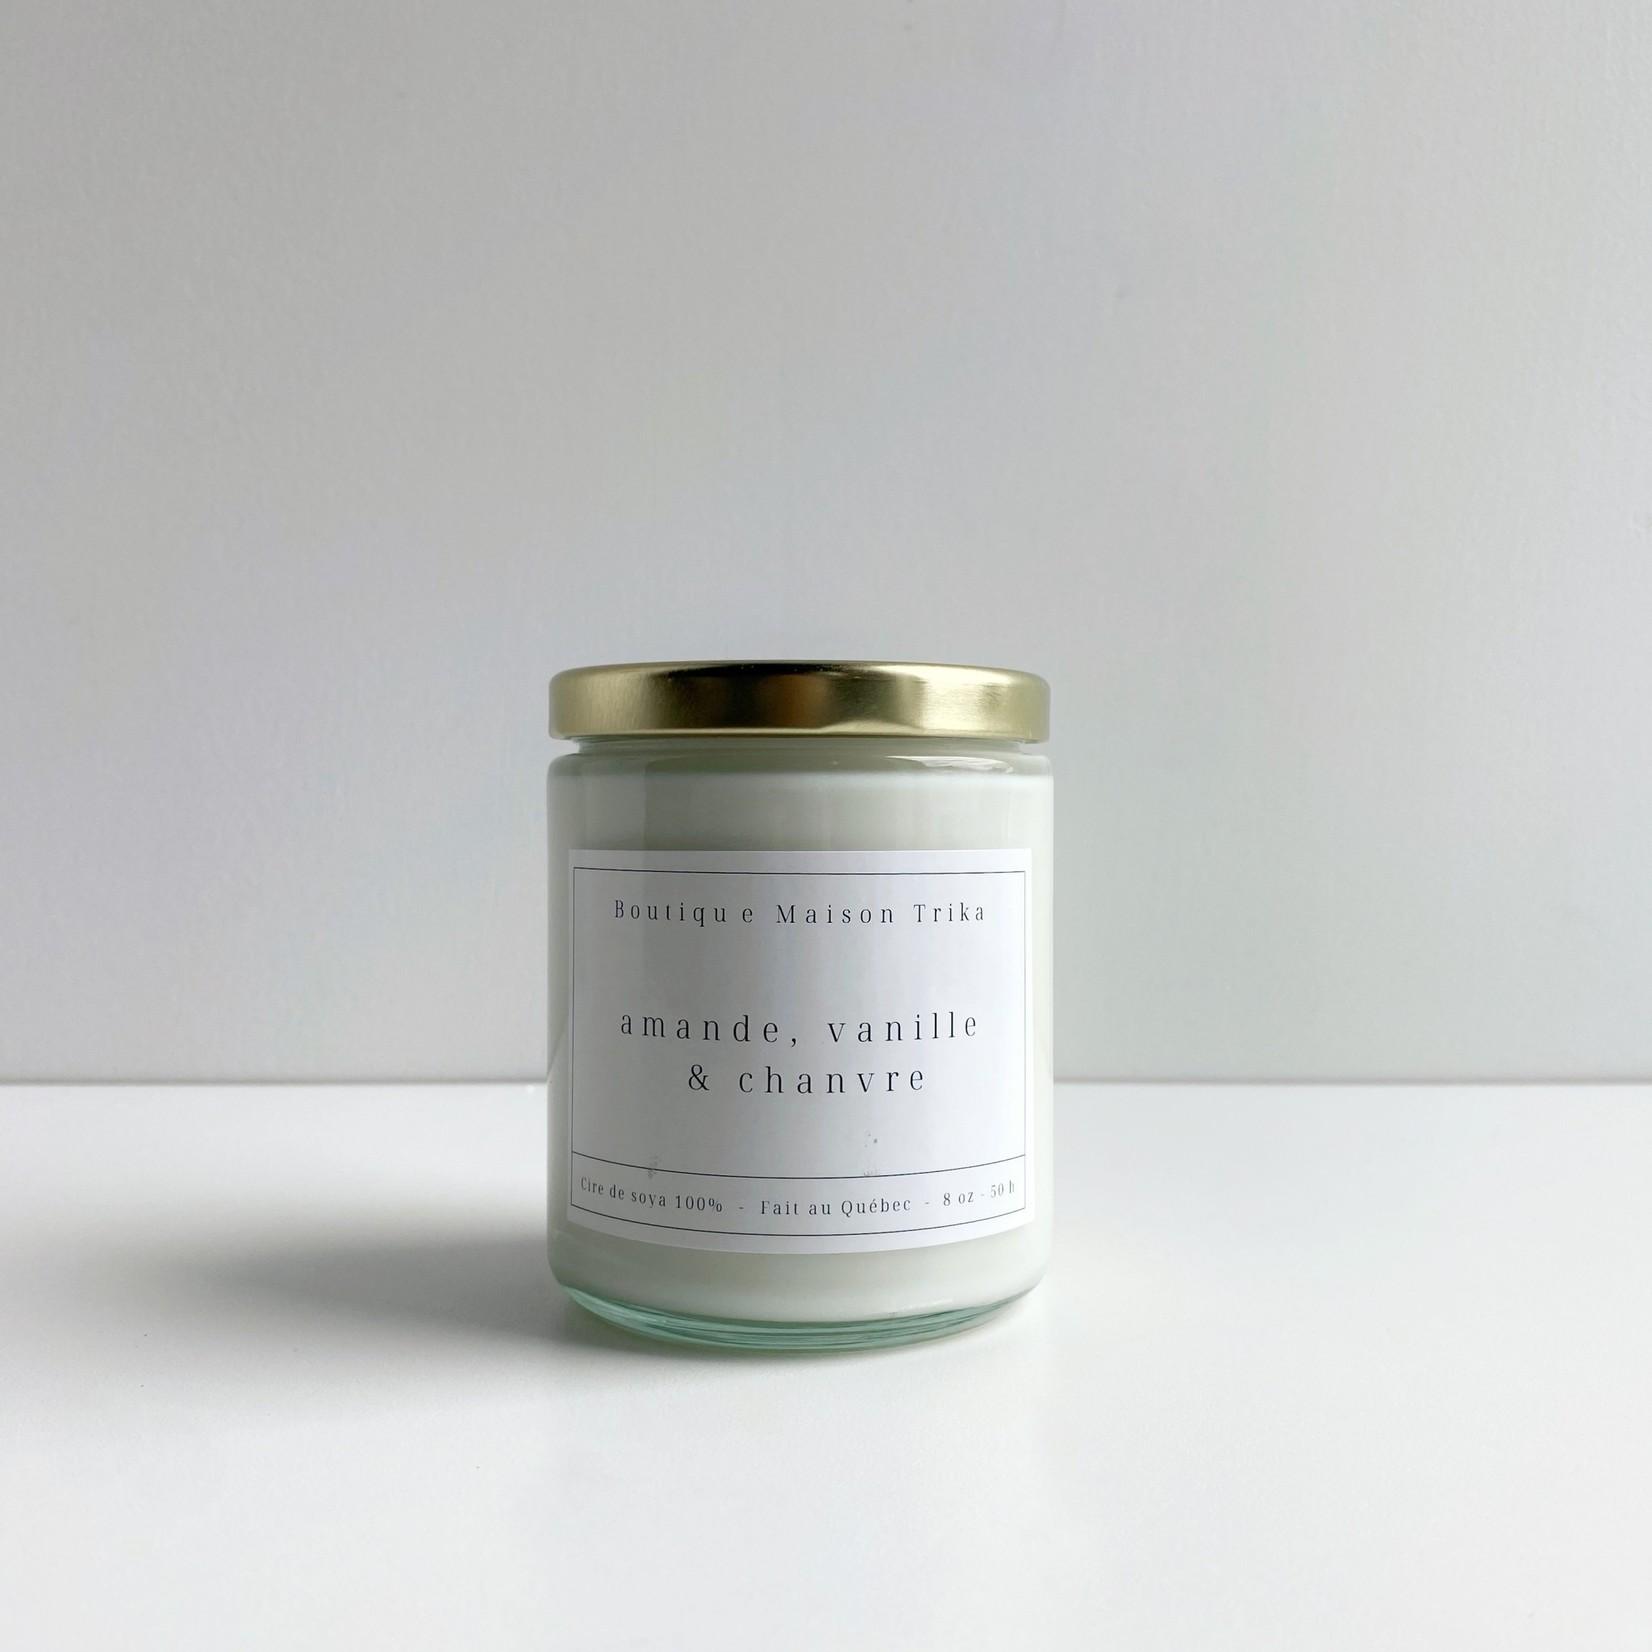 Maison Trika bougie - Amande, vanille & chanvre